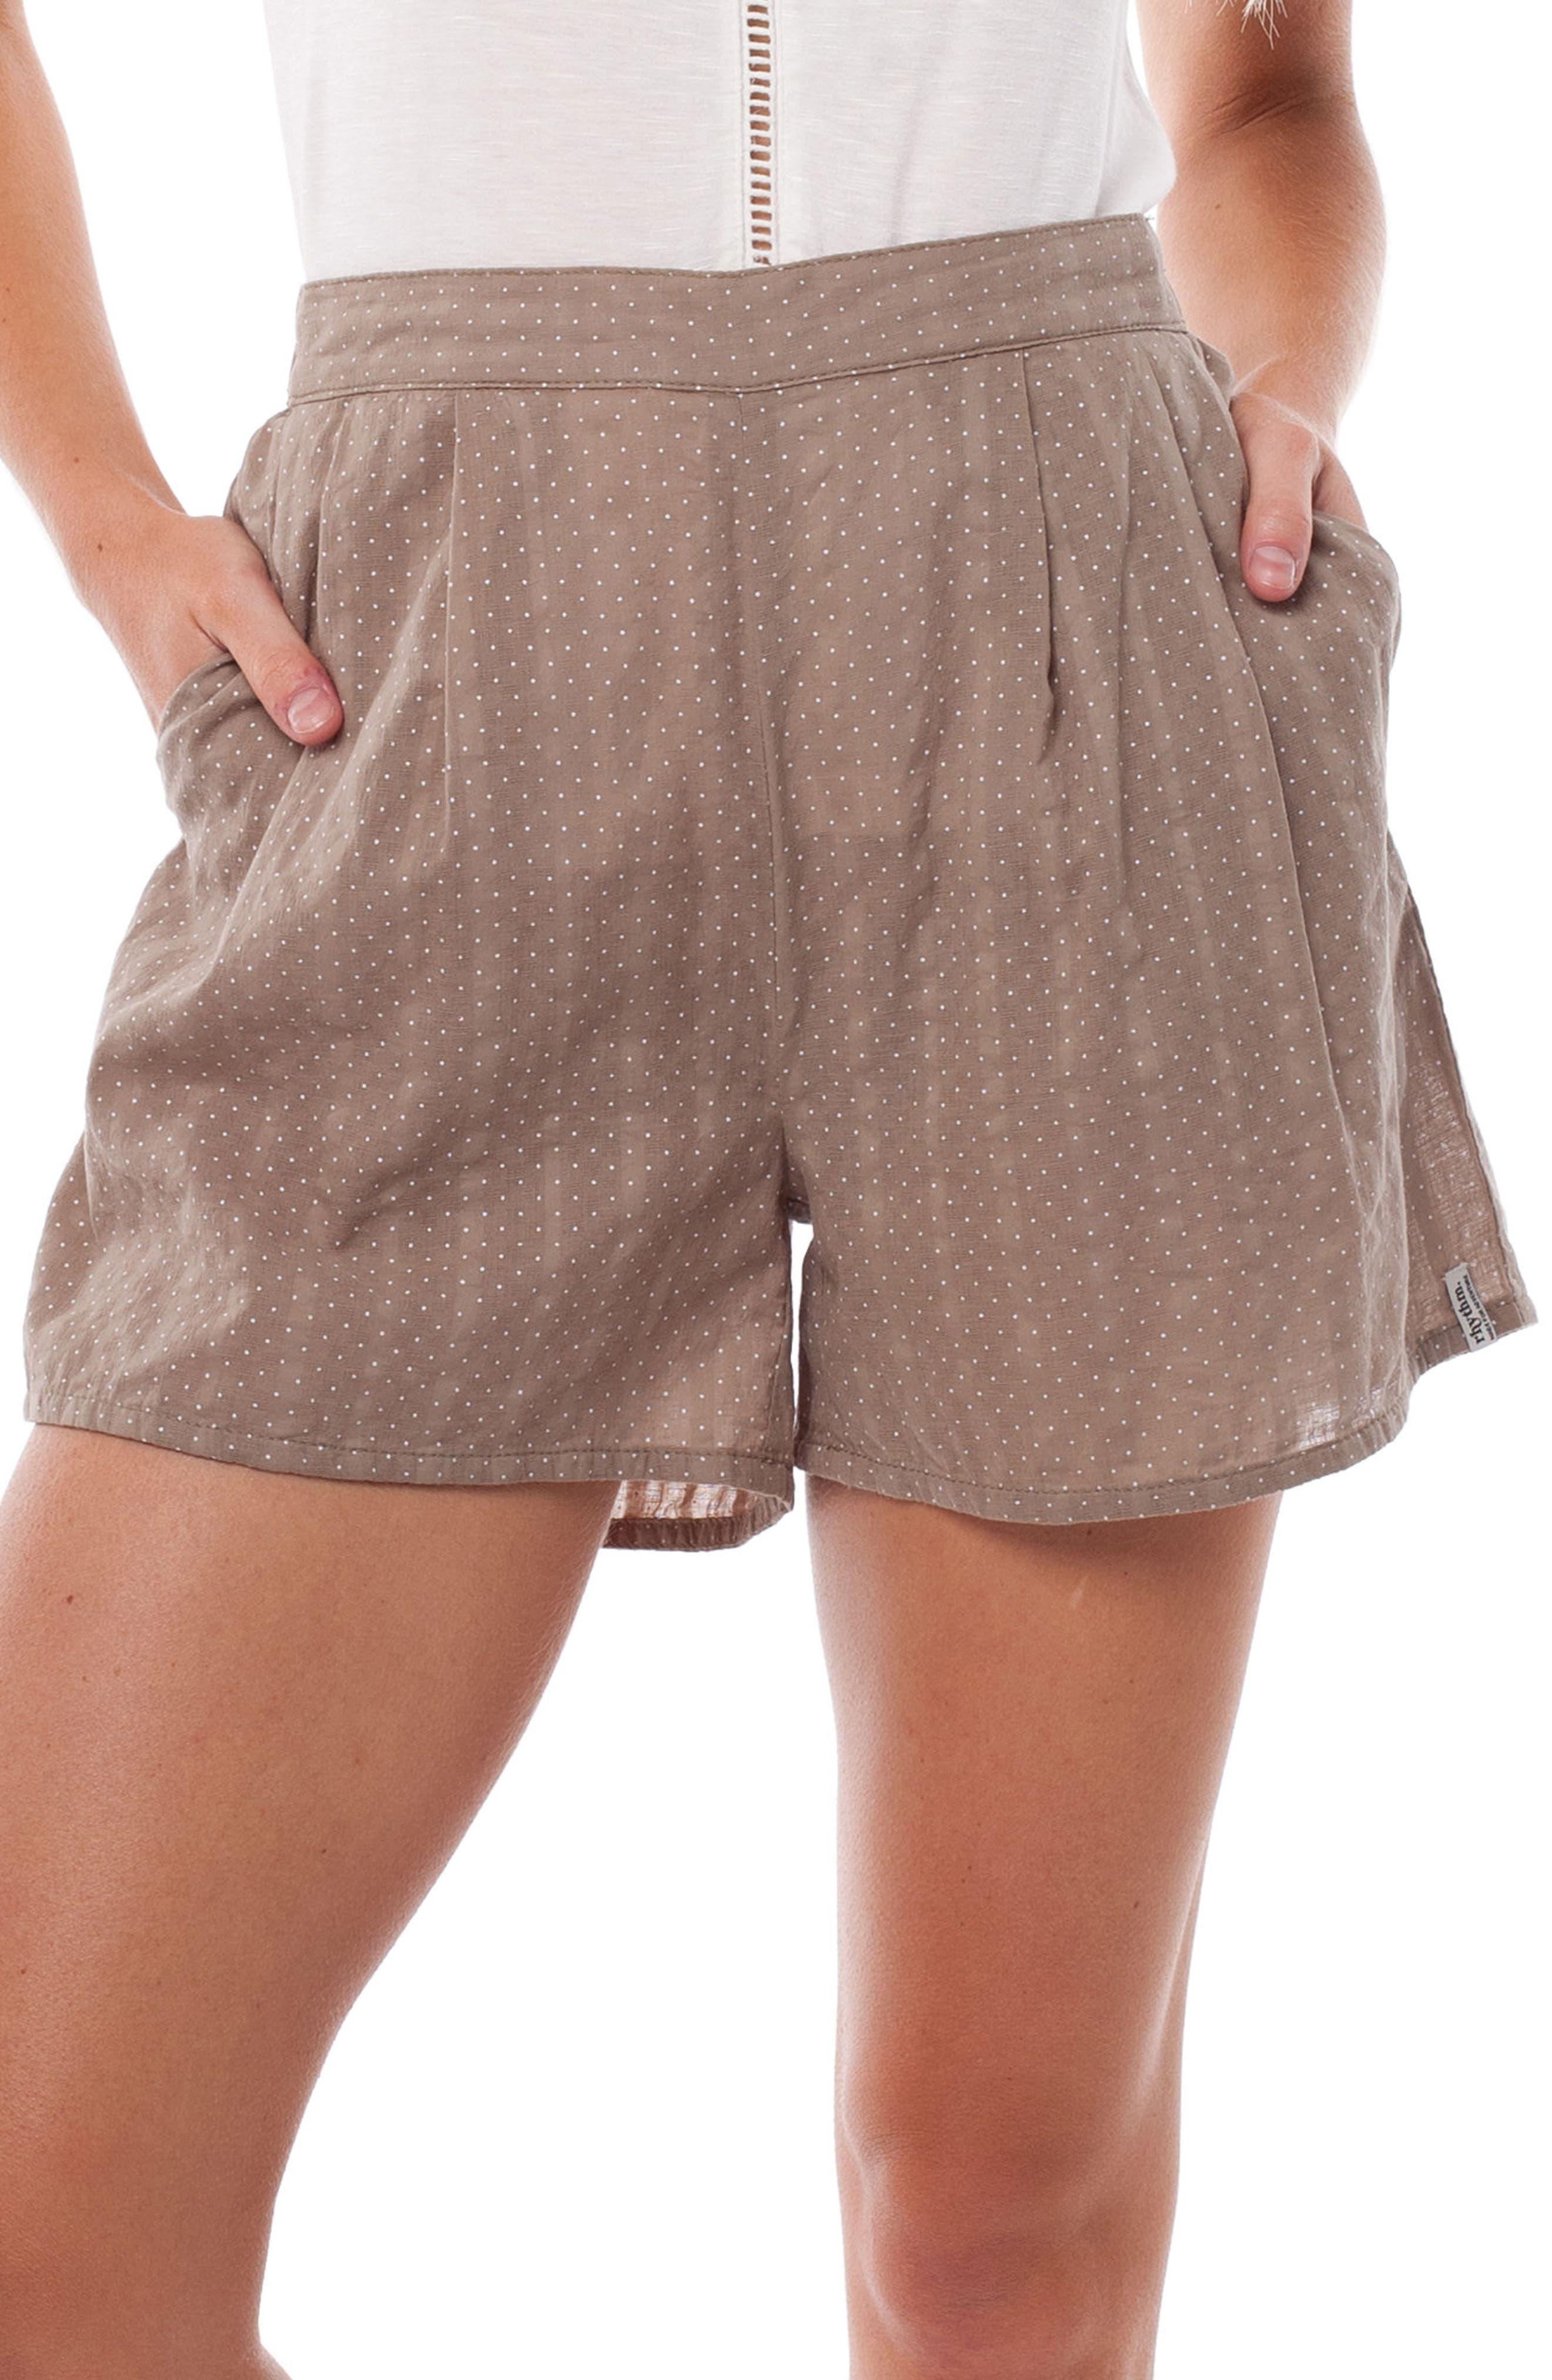 Messina Cover-Up Shorts,                         Main,                         color, 230